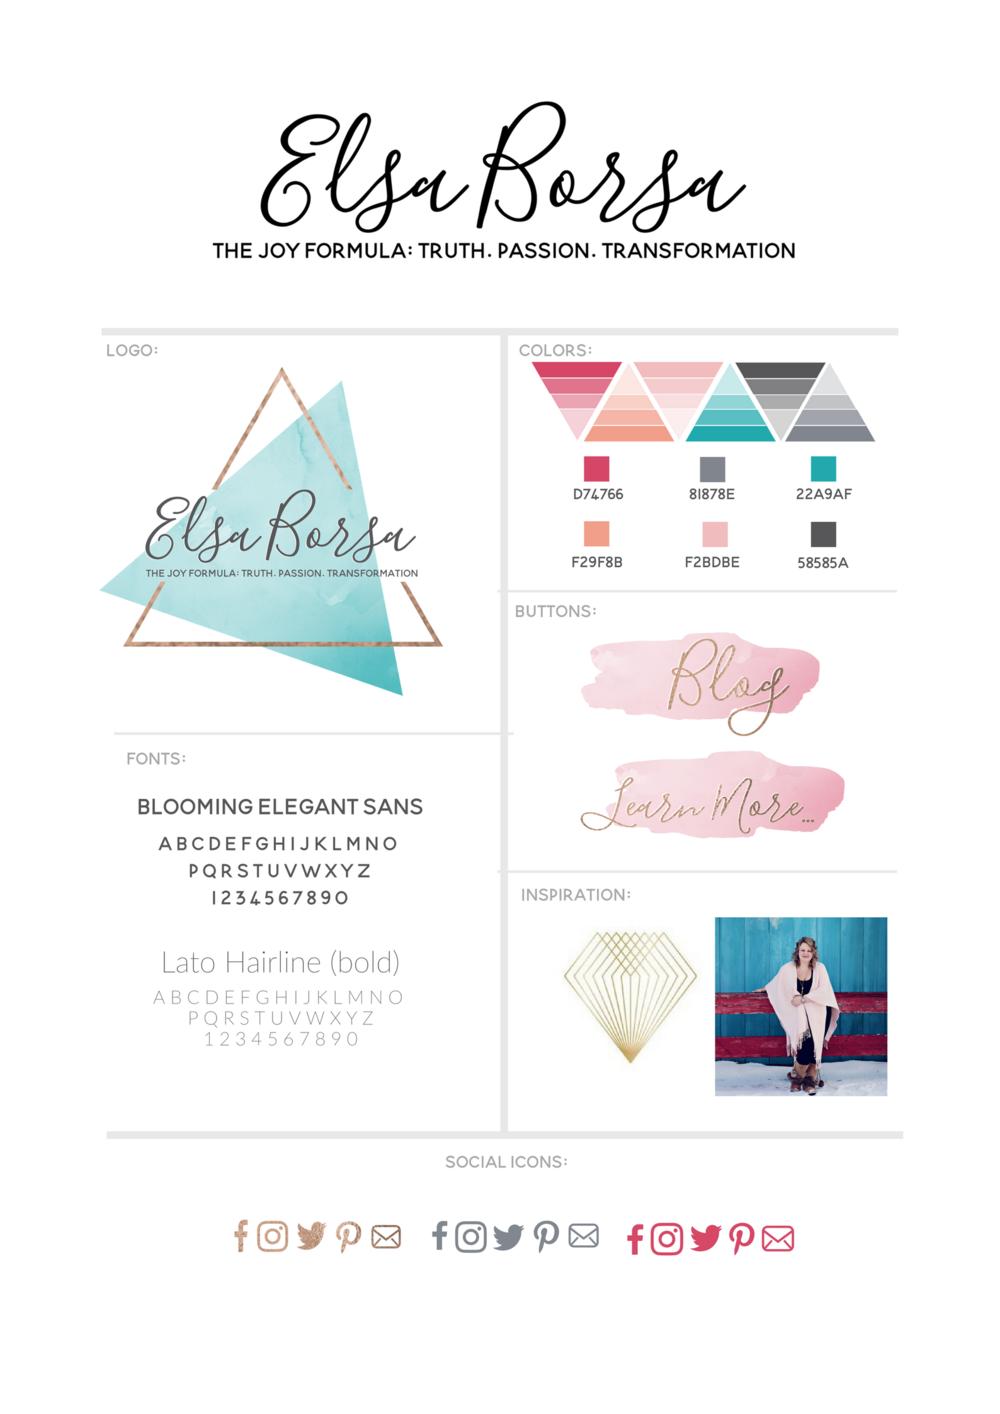 Elsa Borsa | Brand Board | elsaborsa.com | BRAND DESIGNER: Lady and Company Creative